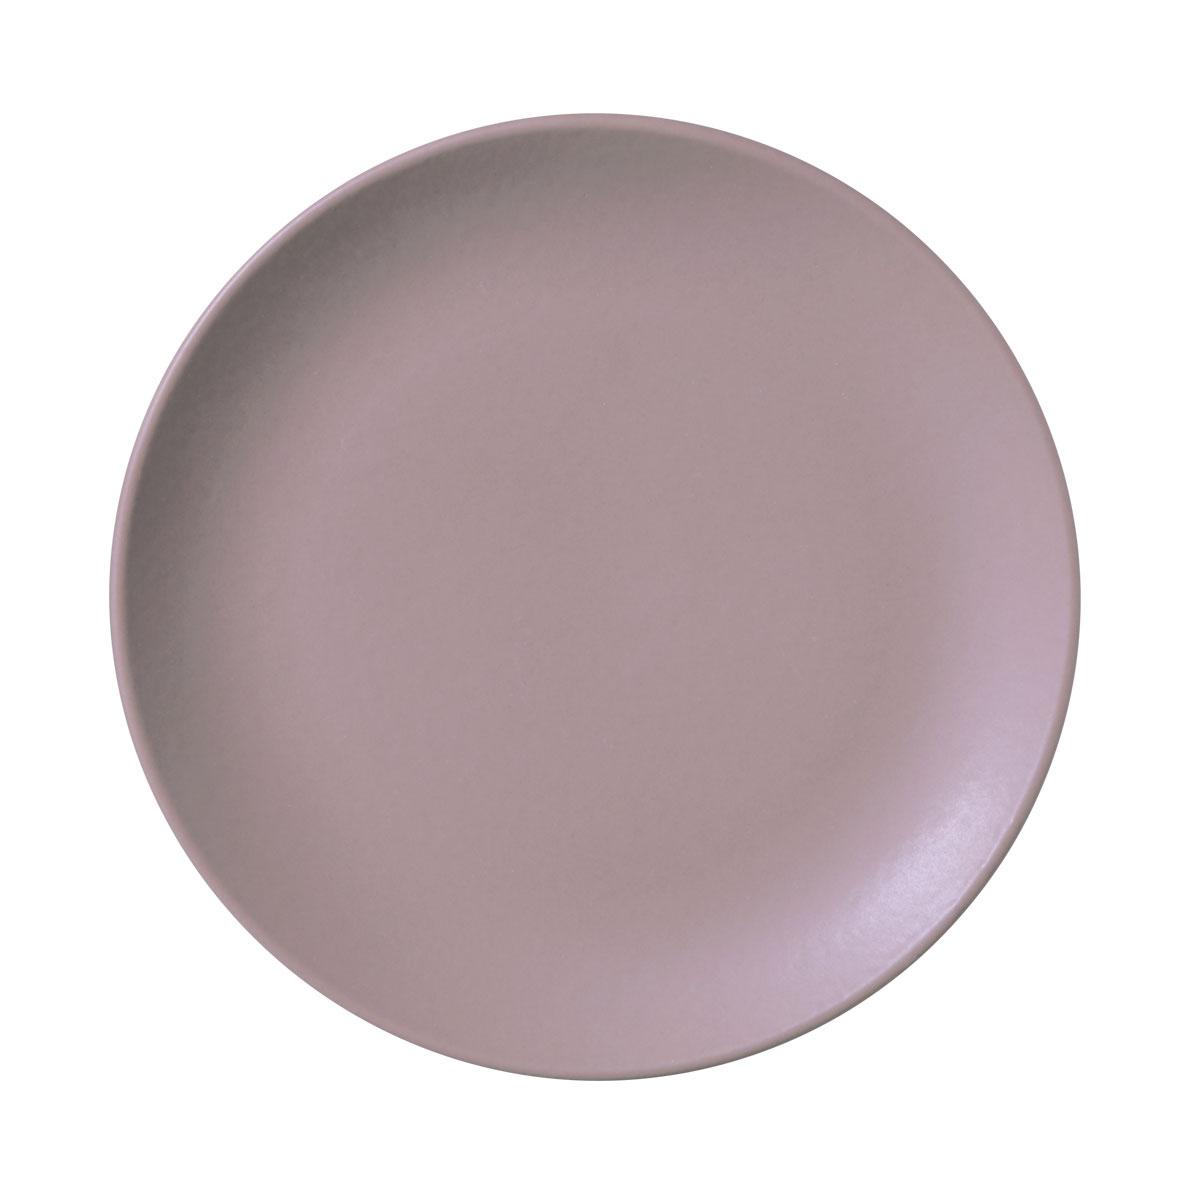 Prato Sobremesa 01 Peça Coup Stoneware Mahogany 20 cm Porto Brasil